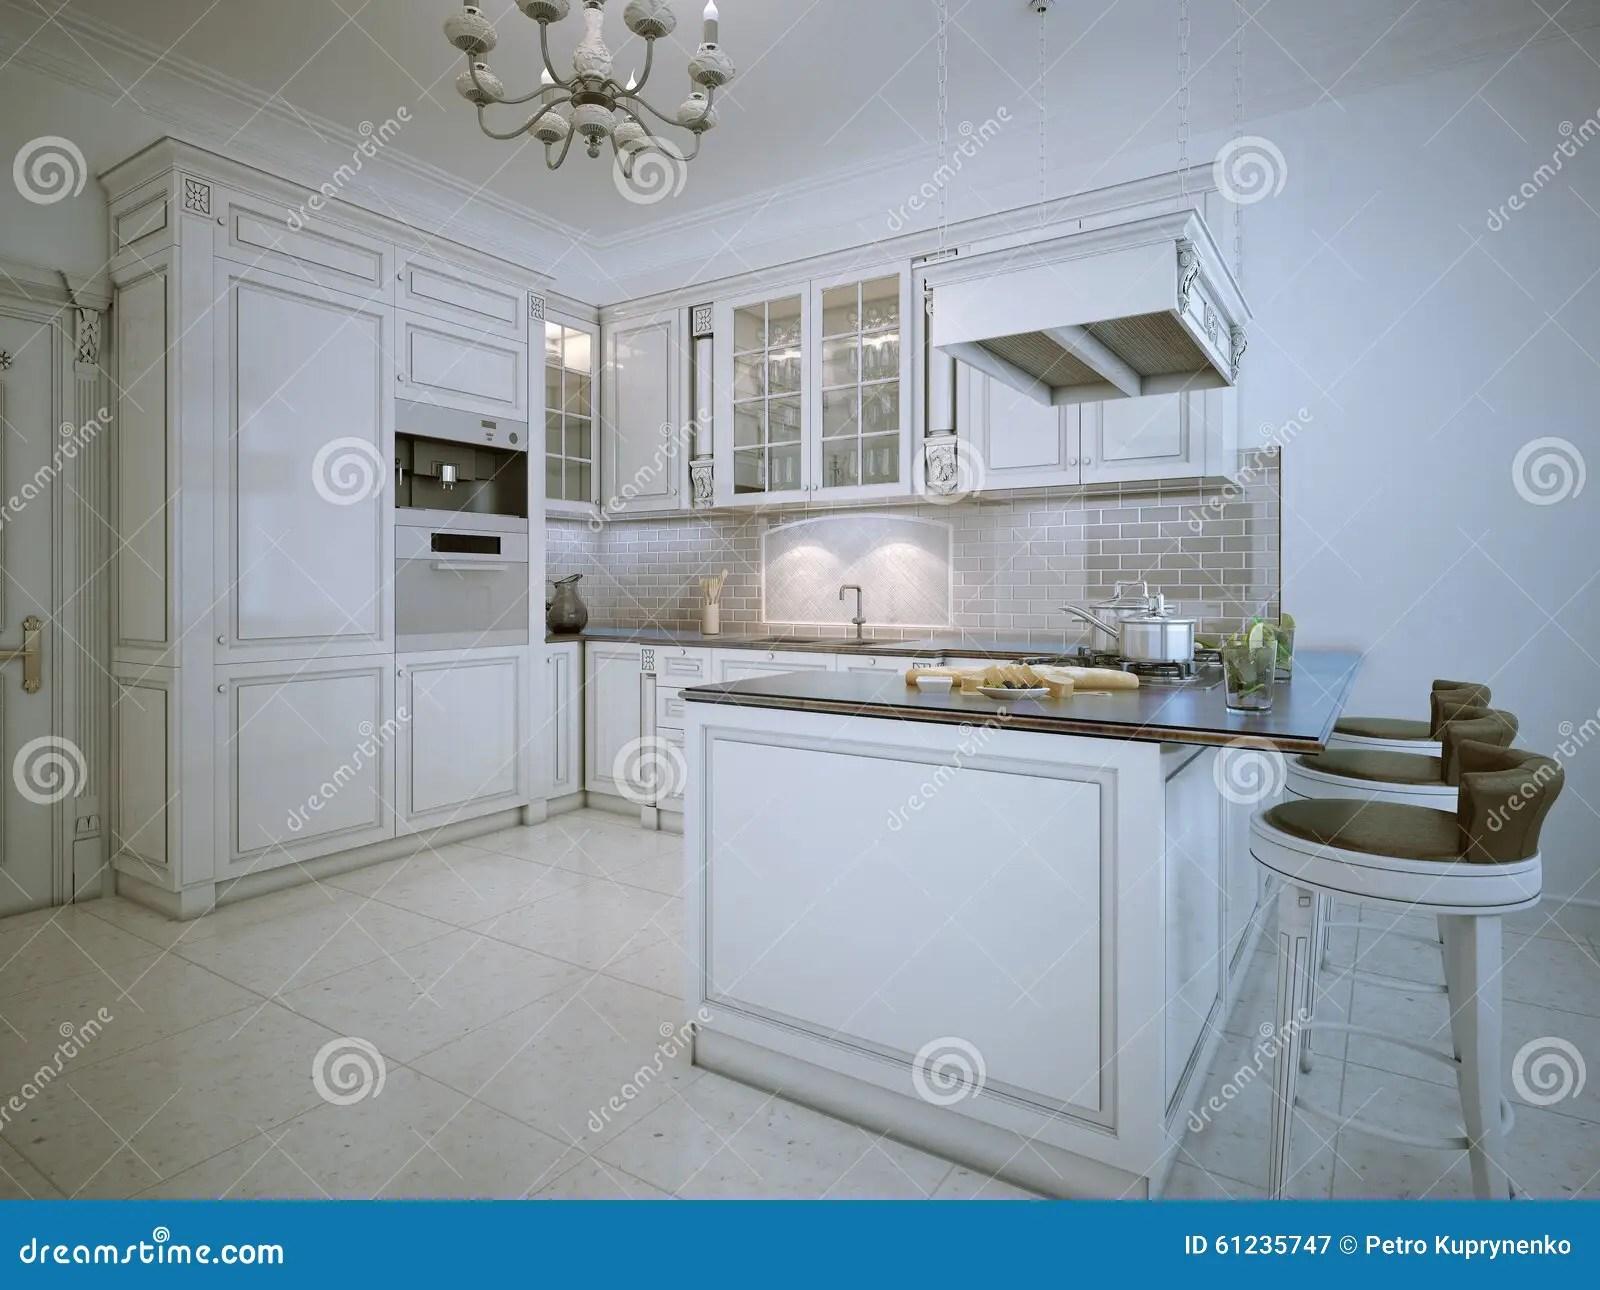 kitchen art aide dishwasher 厨房艺术装饰样式库存例证 插画包括有楼层 窗帘 微波 感激的 枝形 厨房艺术装饰样式